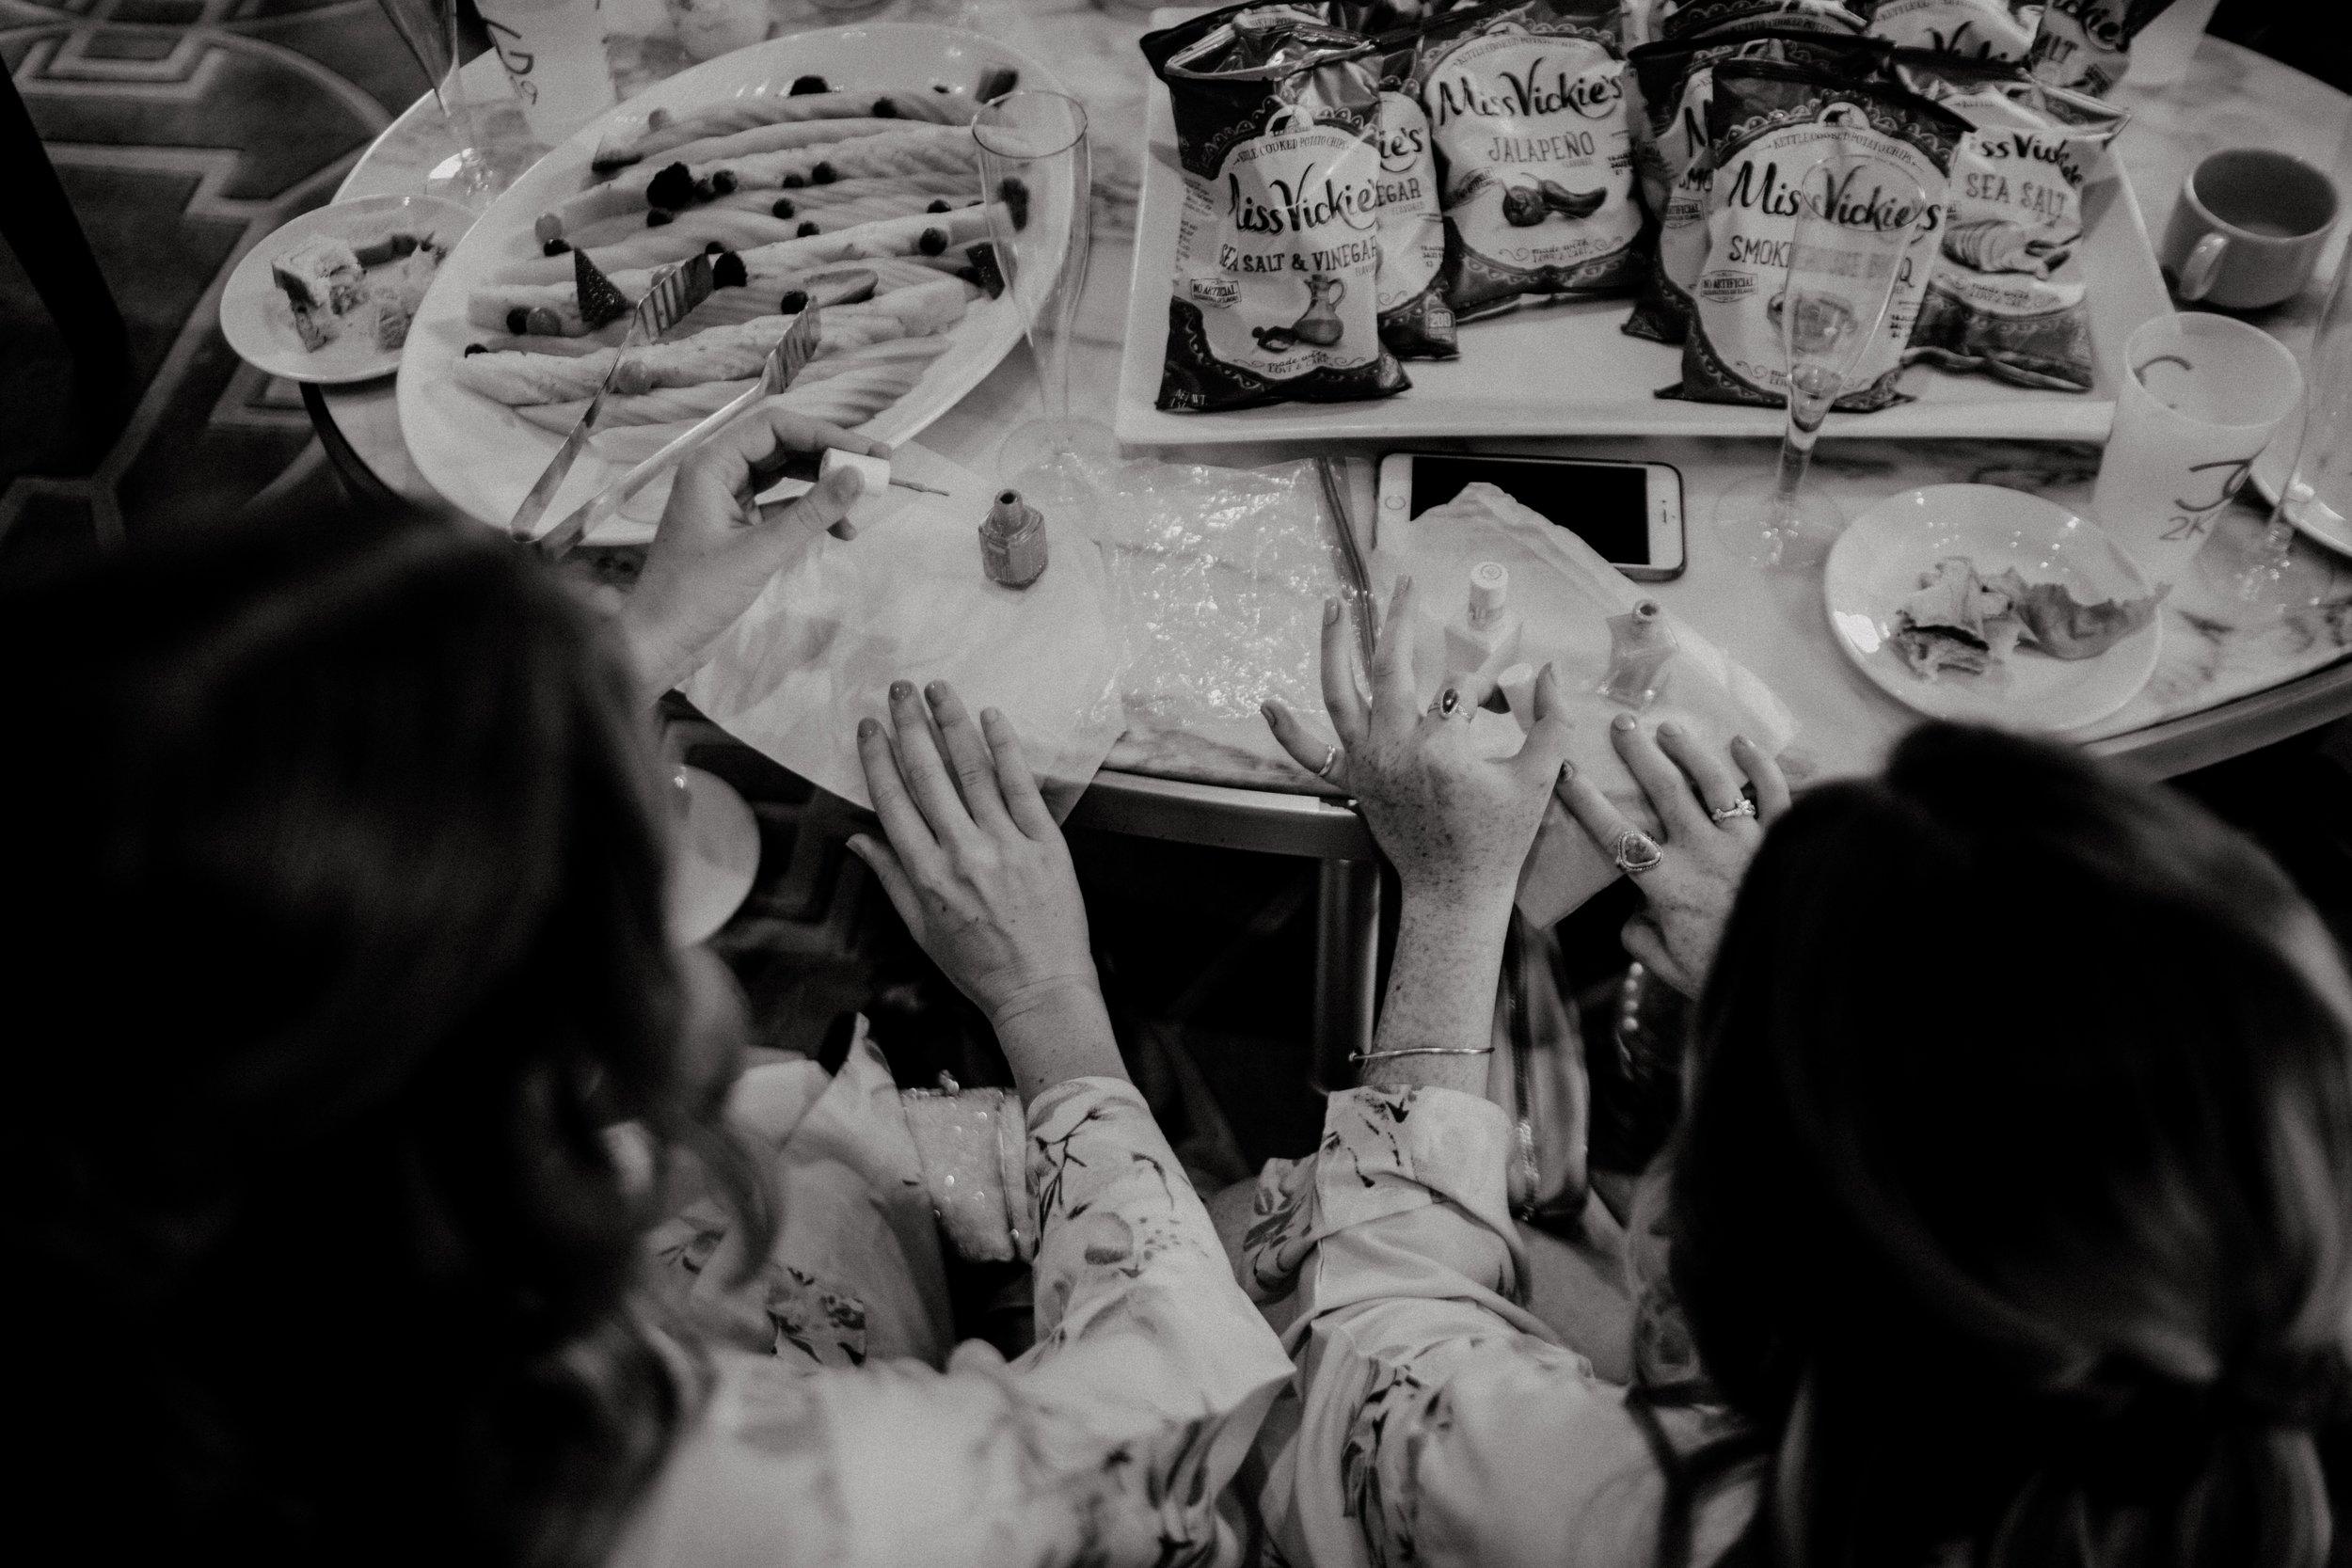 st-anthony-hotel-wedding-photography-10004san-antonio.JPG